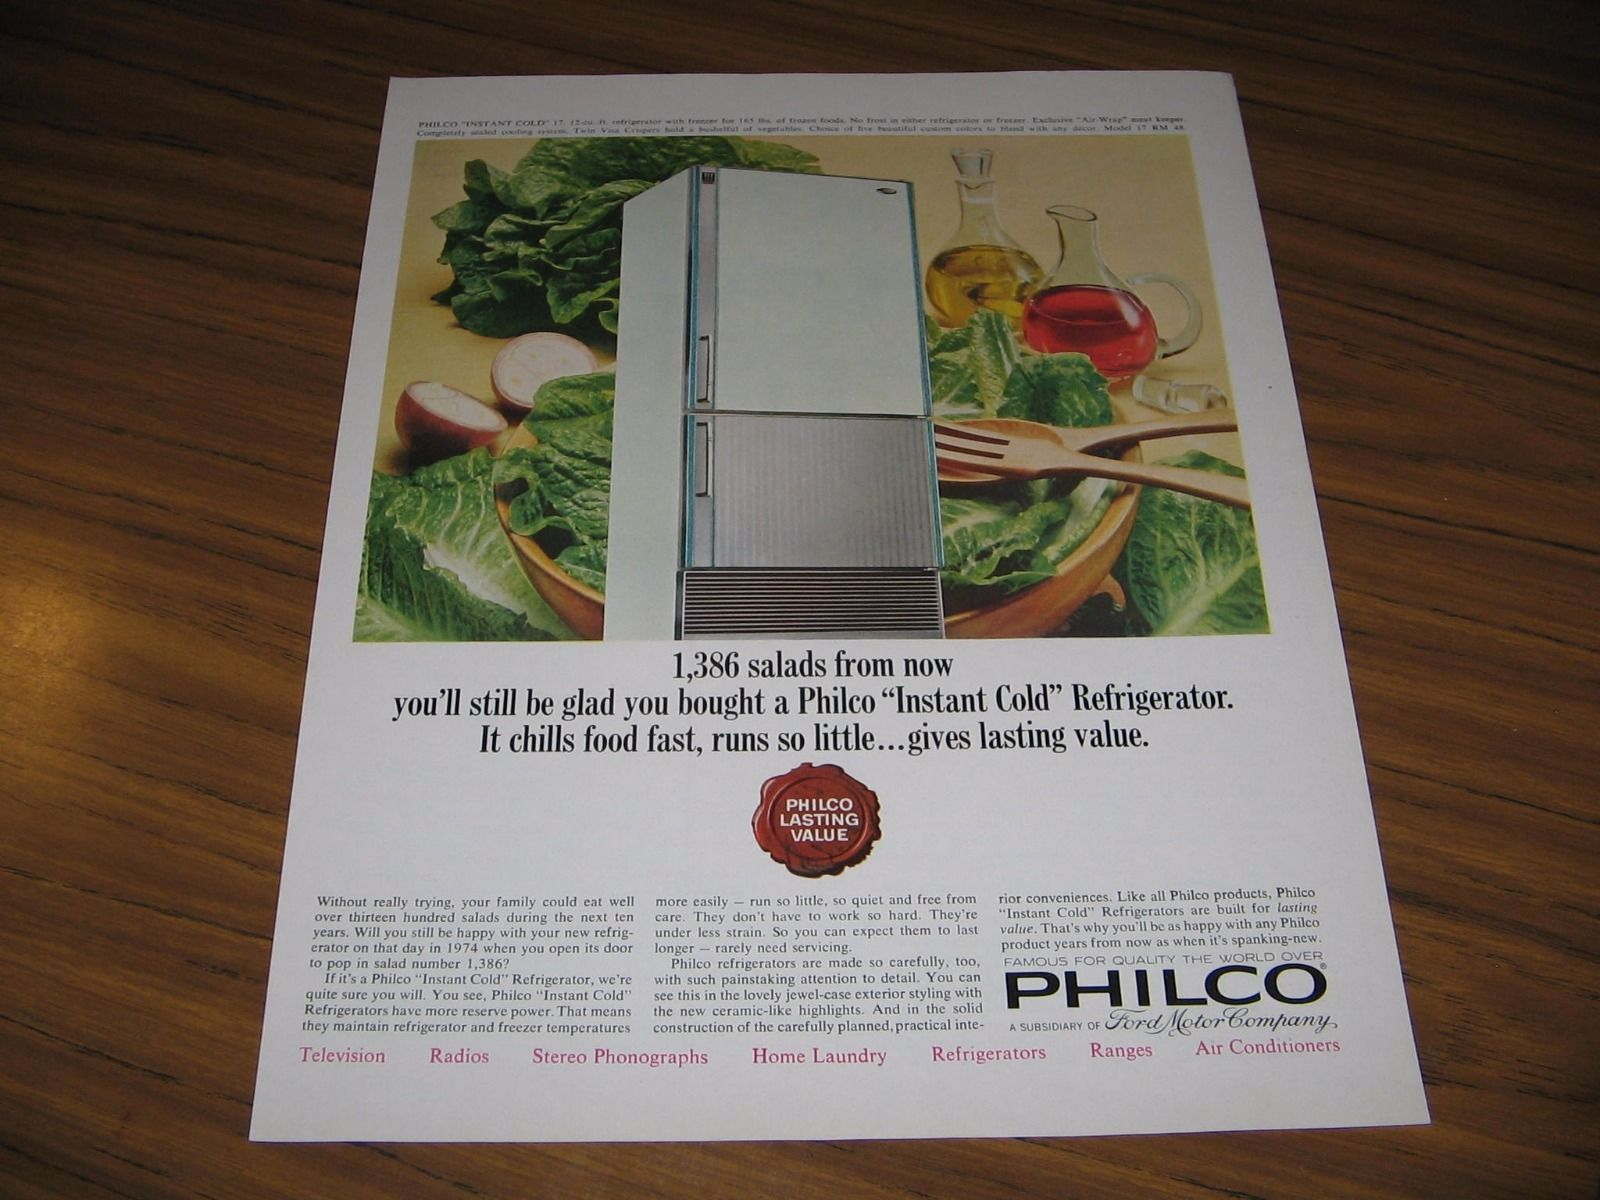 1964 Print Ad Philco Instant Cold Refrigerators Model 17 RM 48